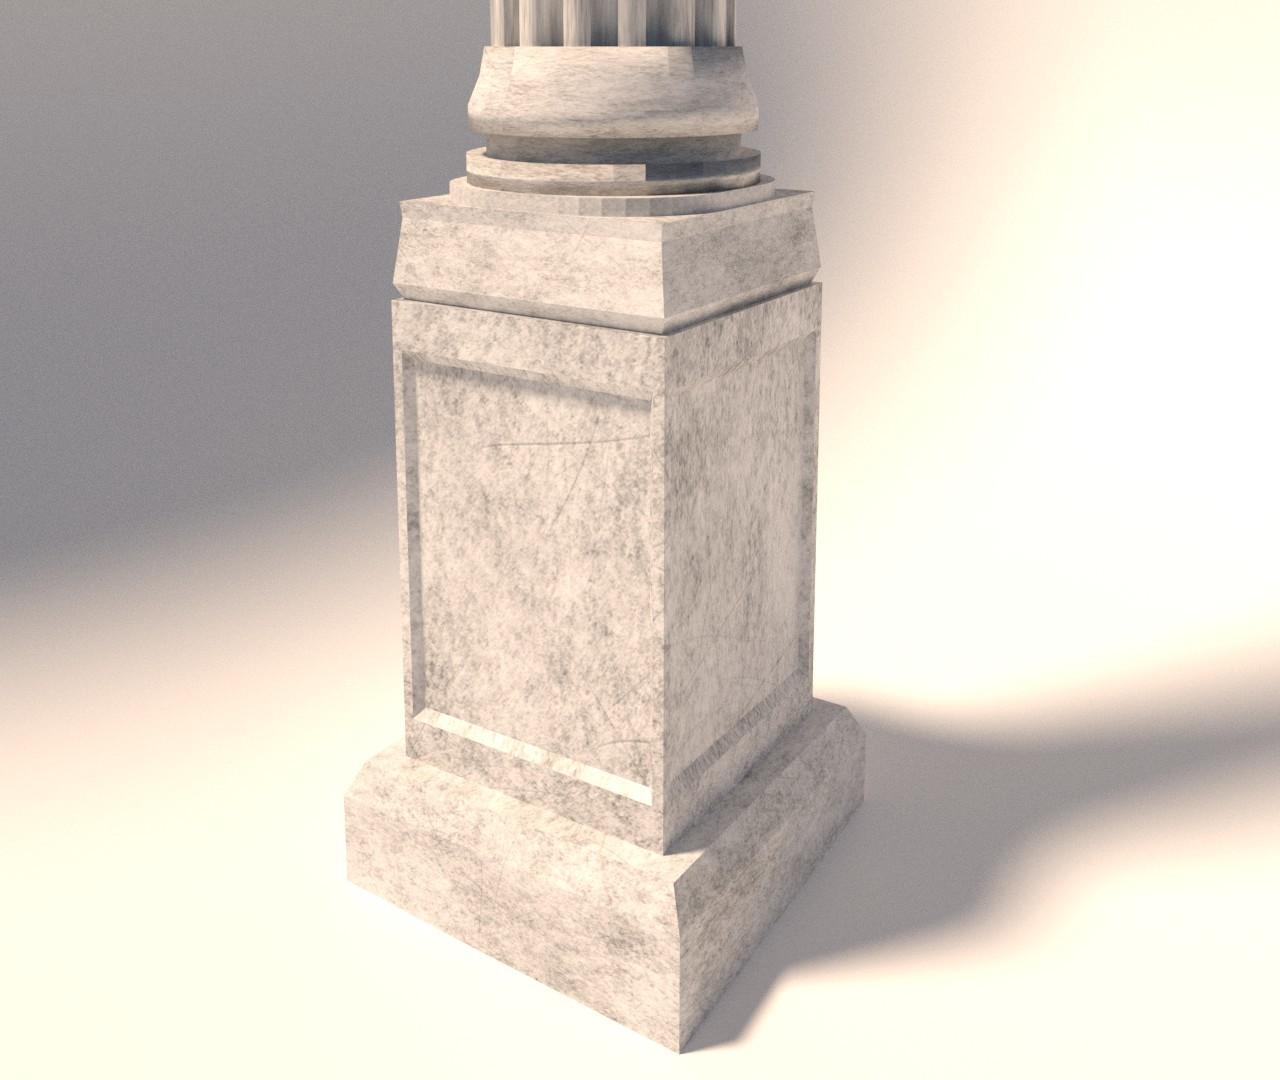 Column 2